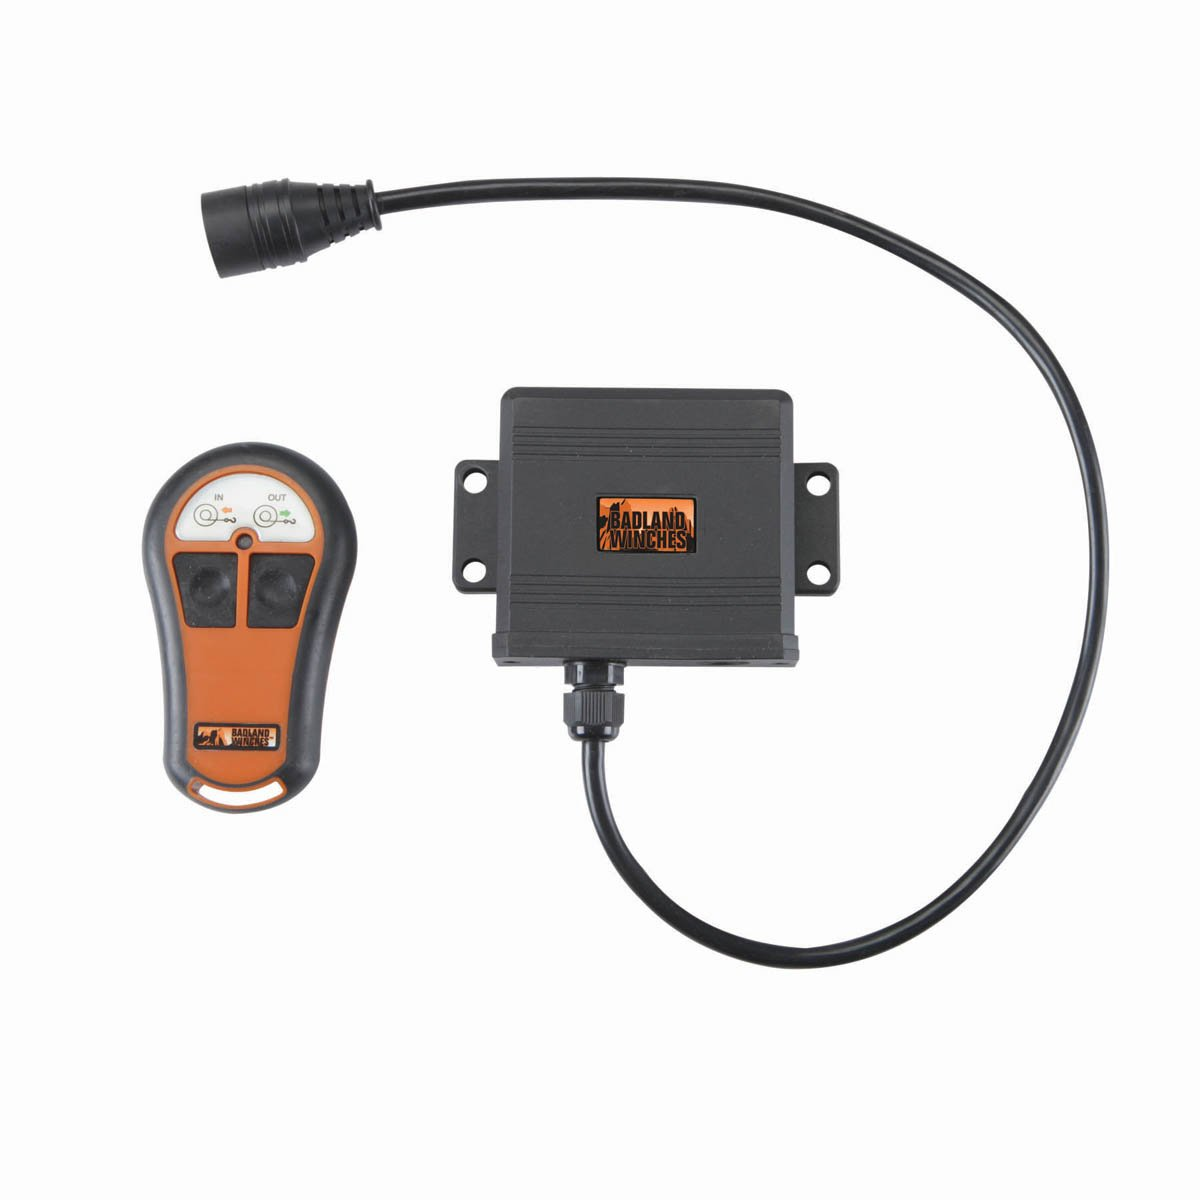 Wireless Winch Remote Control by Badland WinchesTM